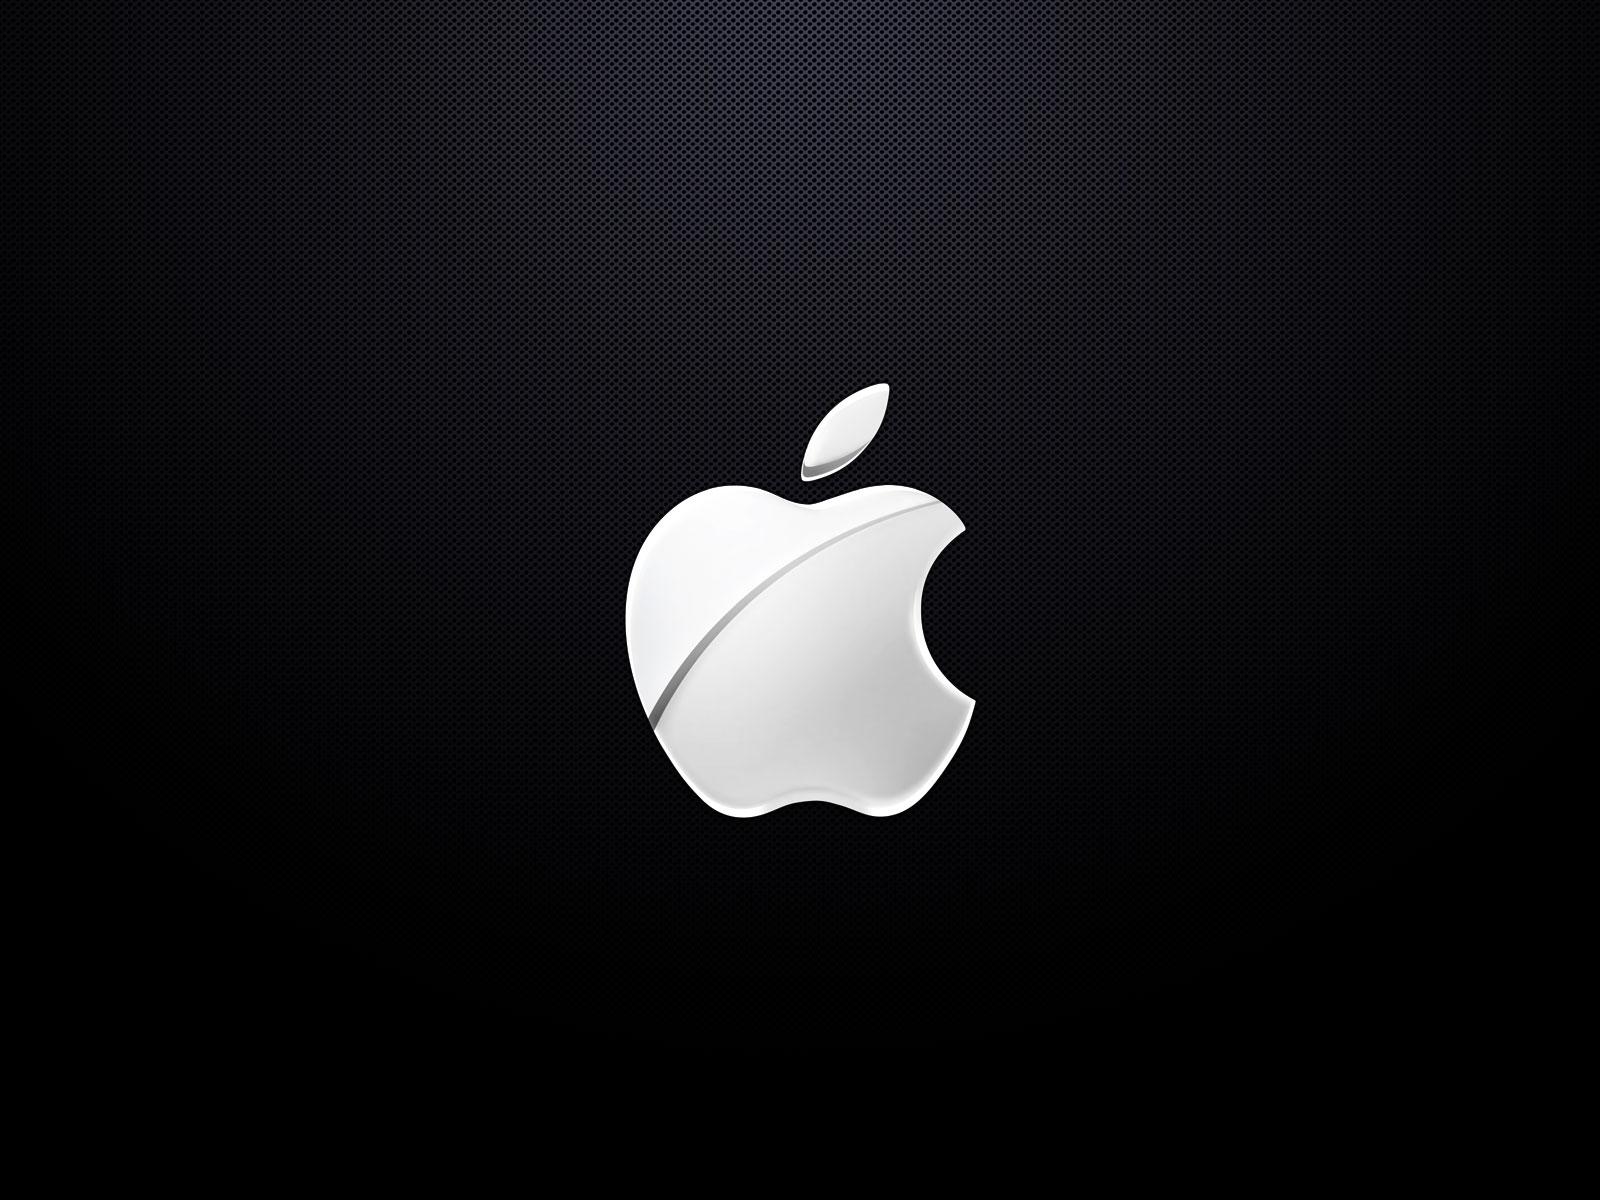 white apple logo wallpaper 1600x1200